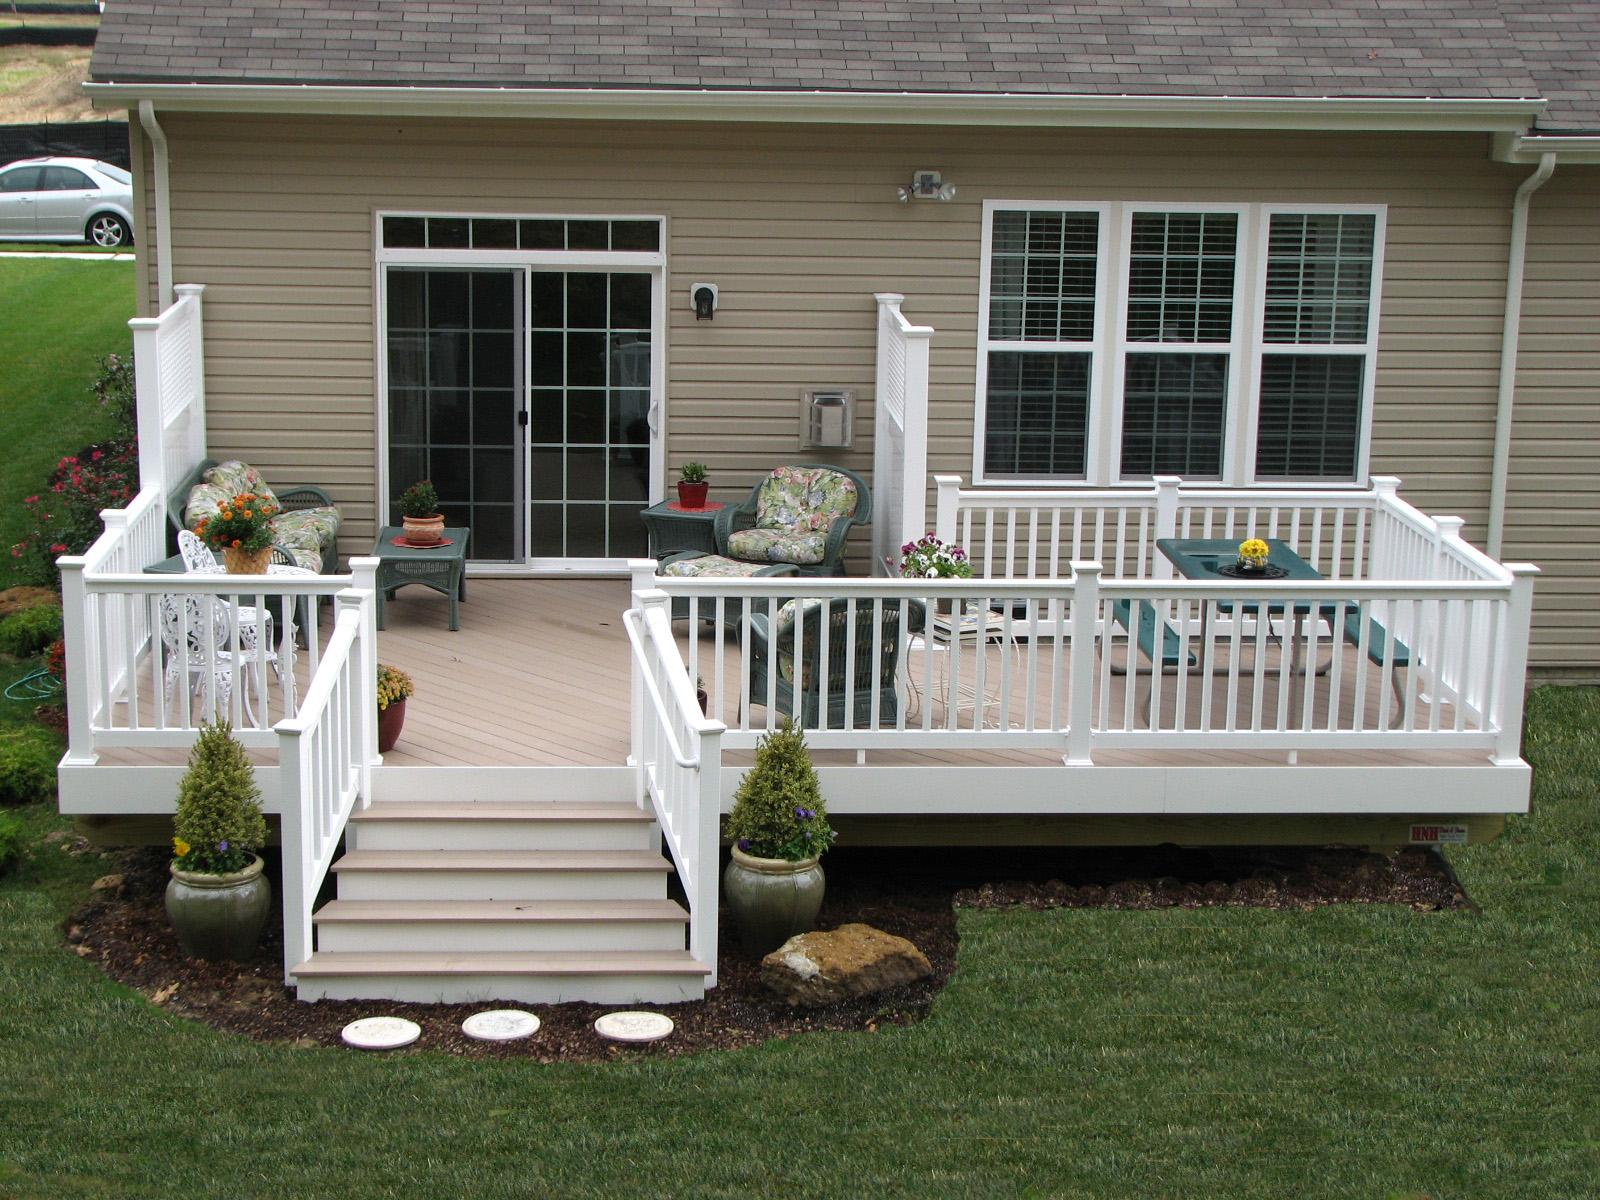 Wood decks vinyl wood decks for Deck plans for mobile homes